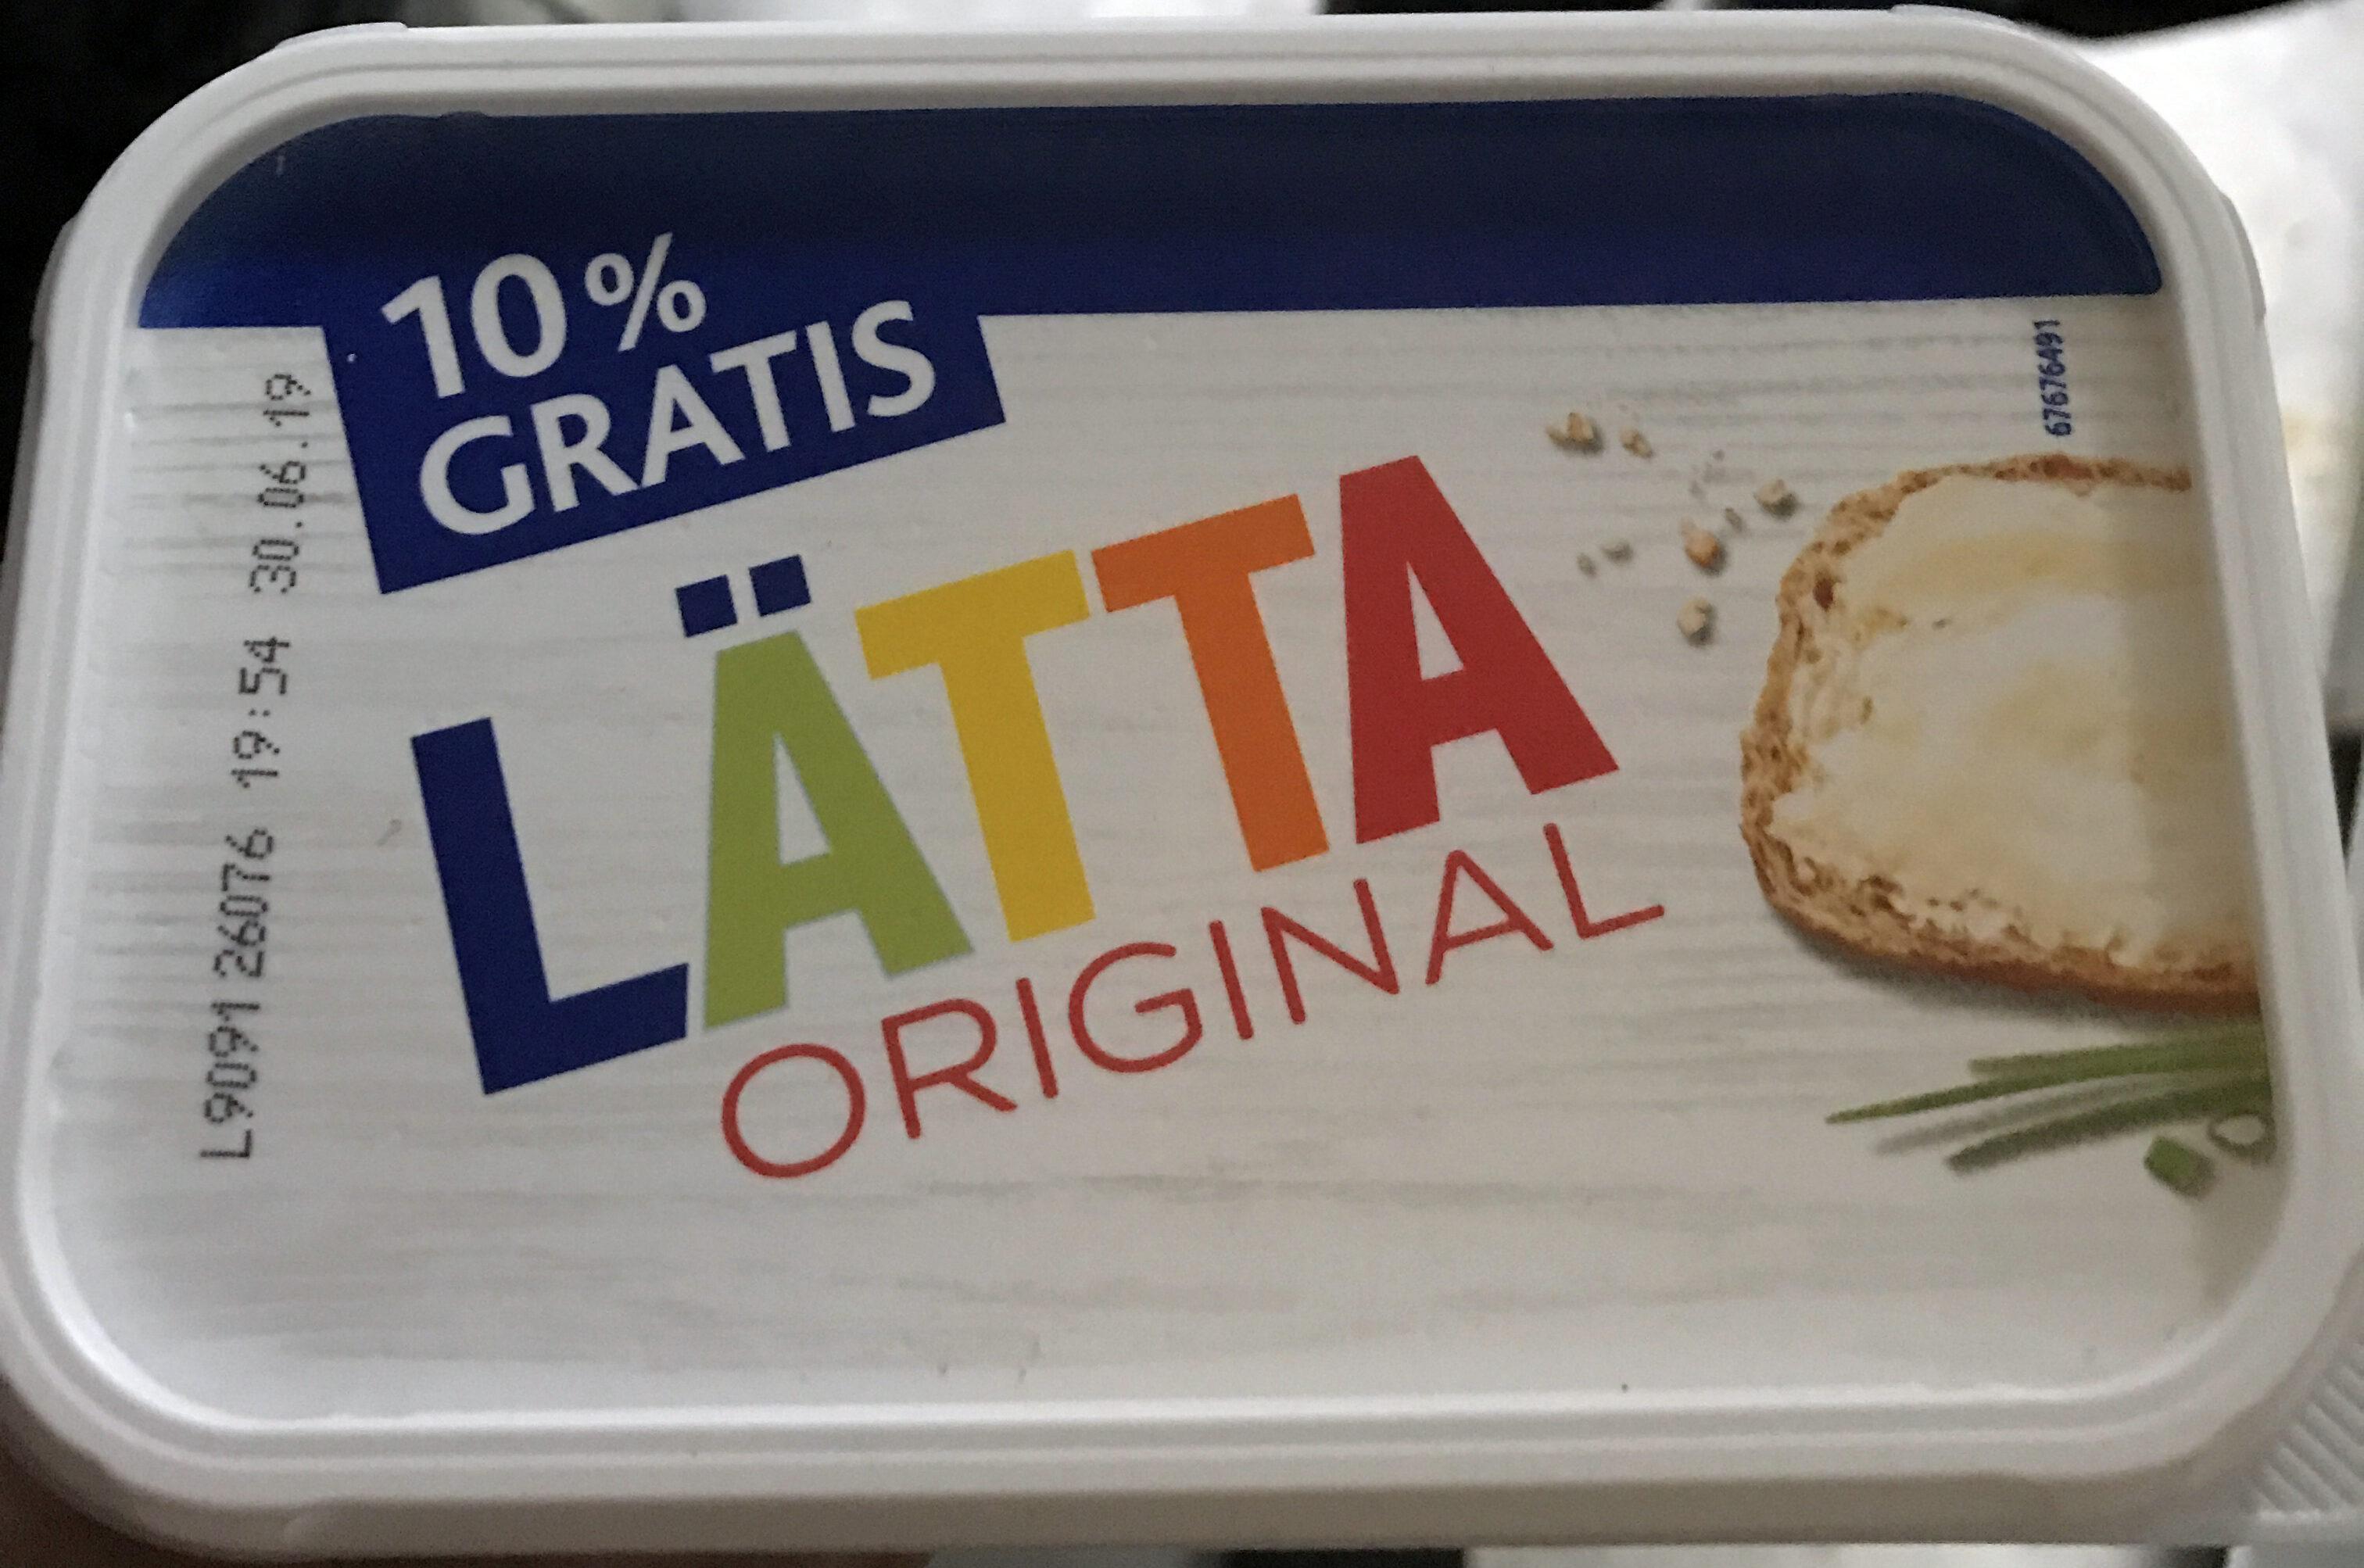 Lätta original - Product - de